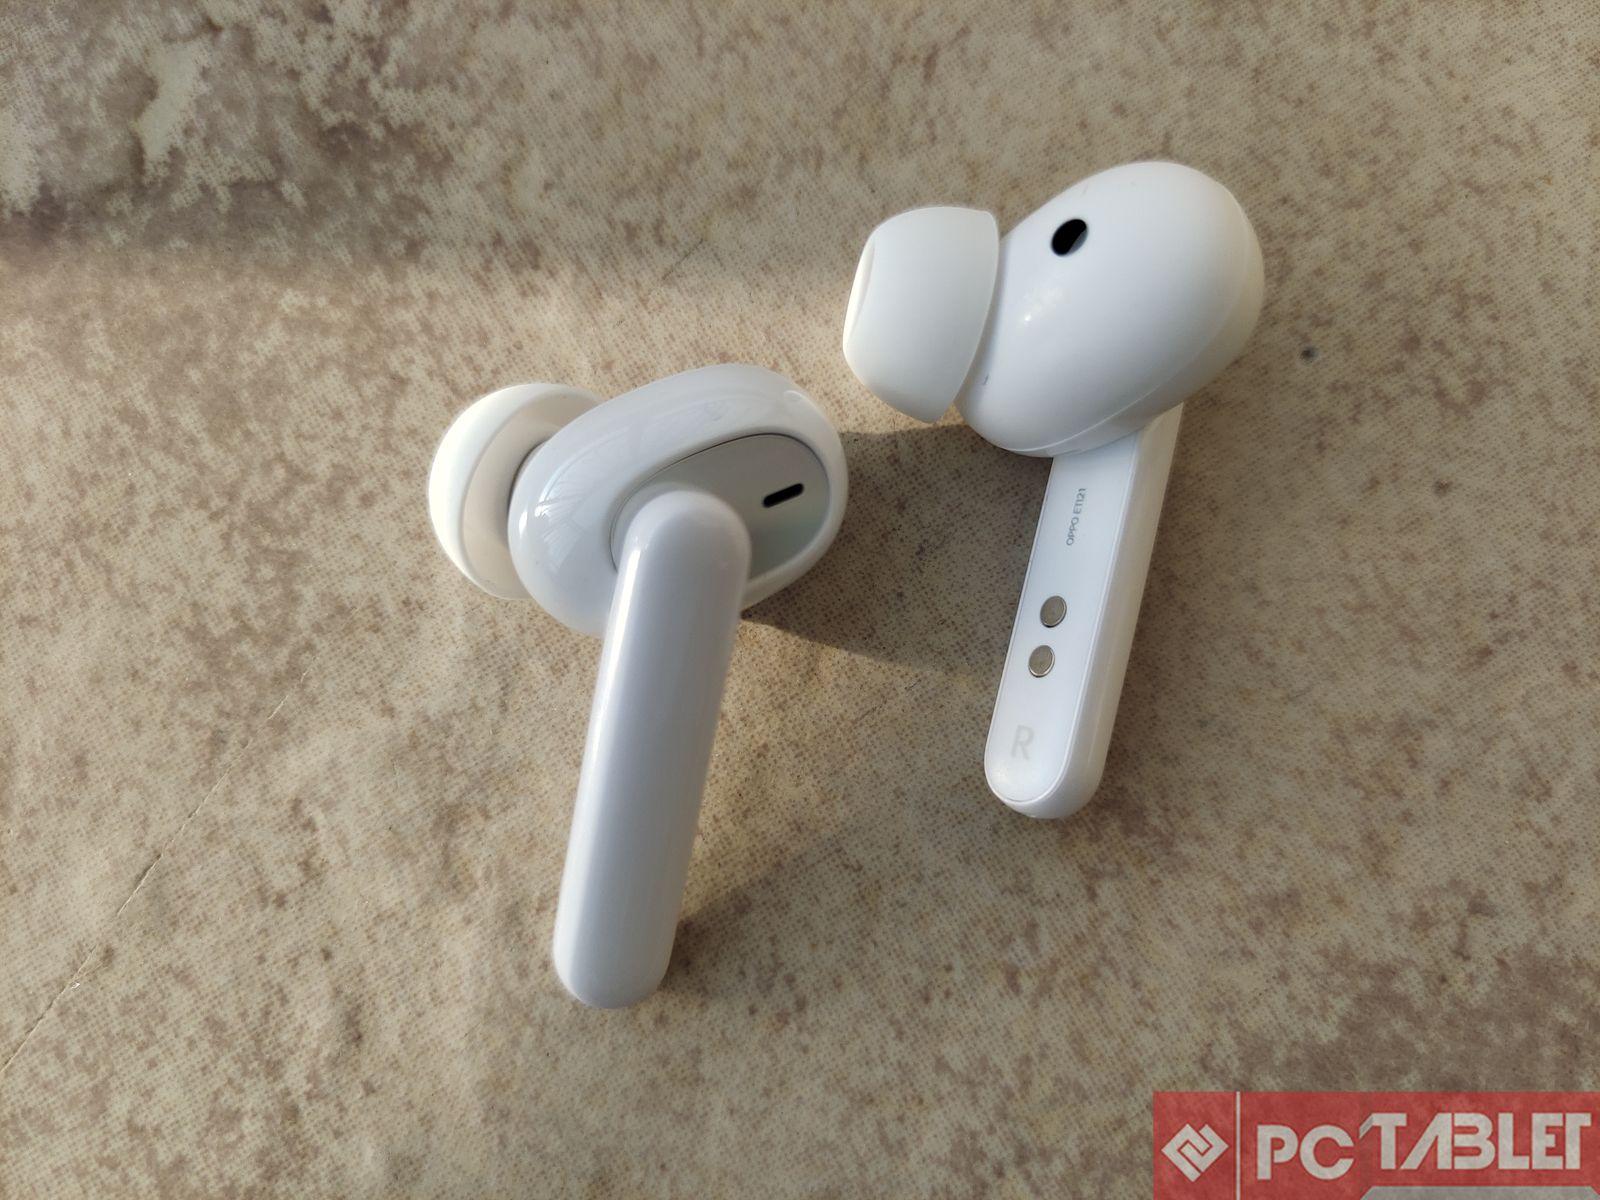 Oppo Enco W51 Truly Wireless Earbuds Review 6